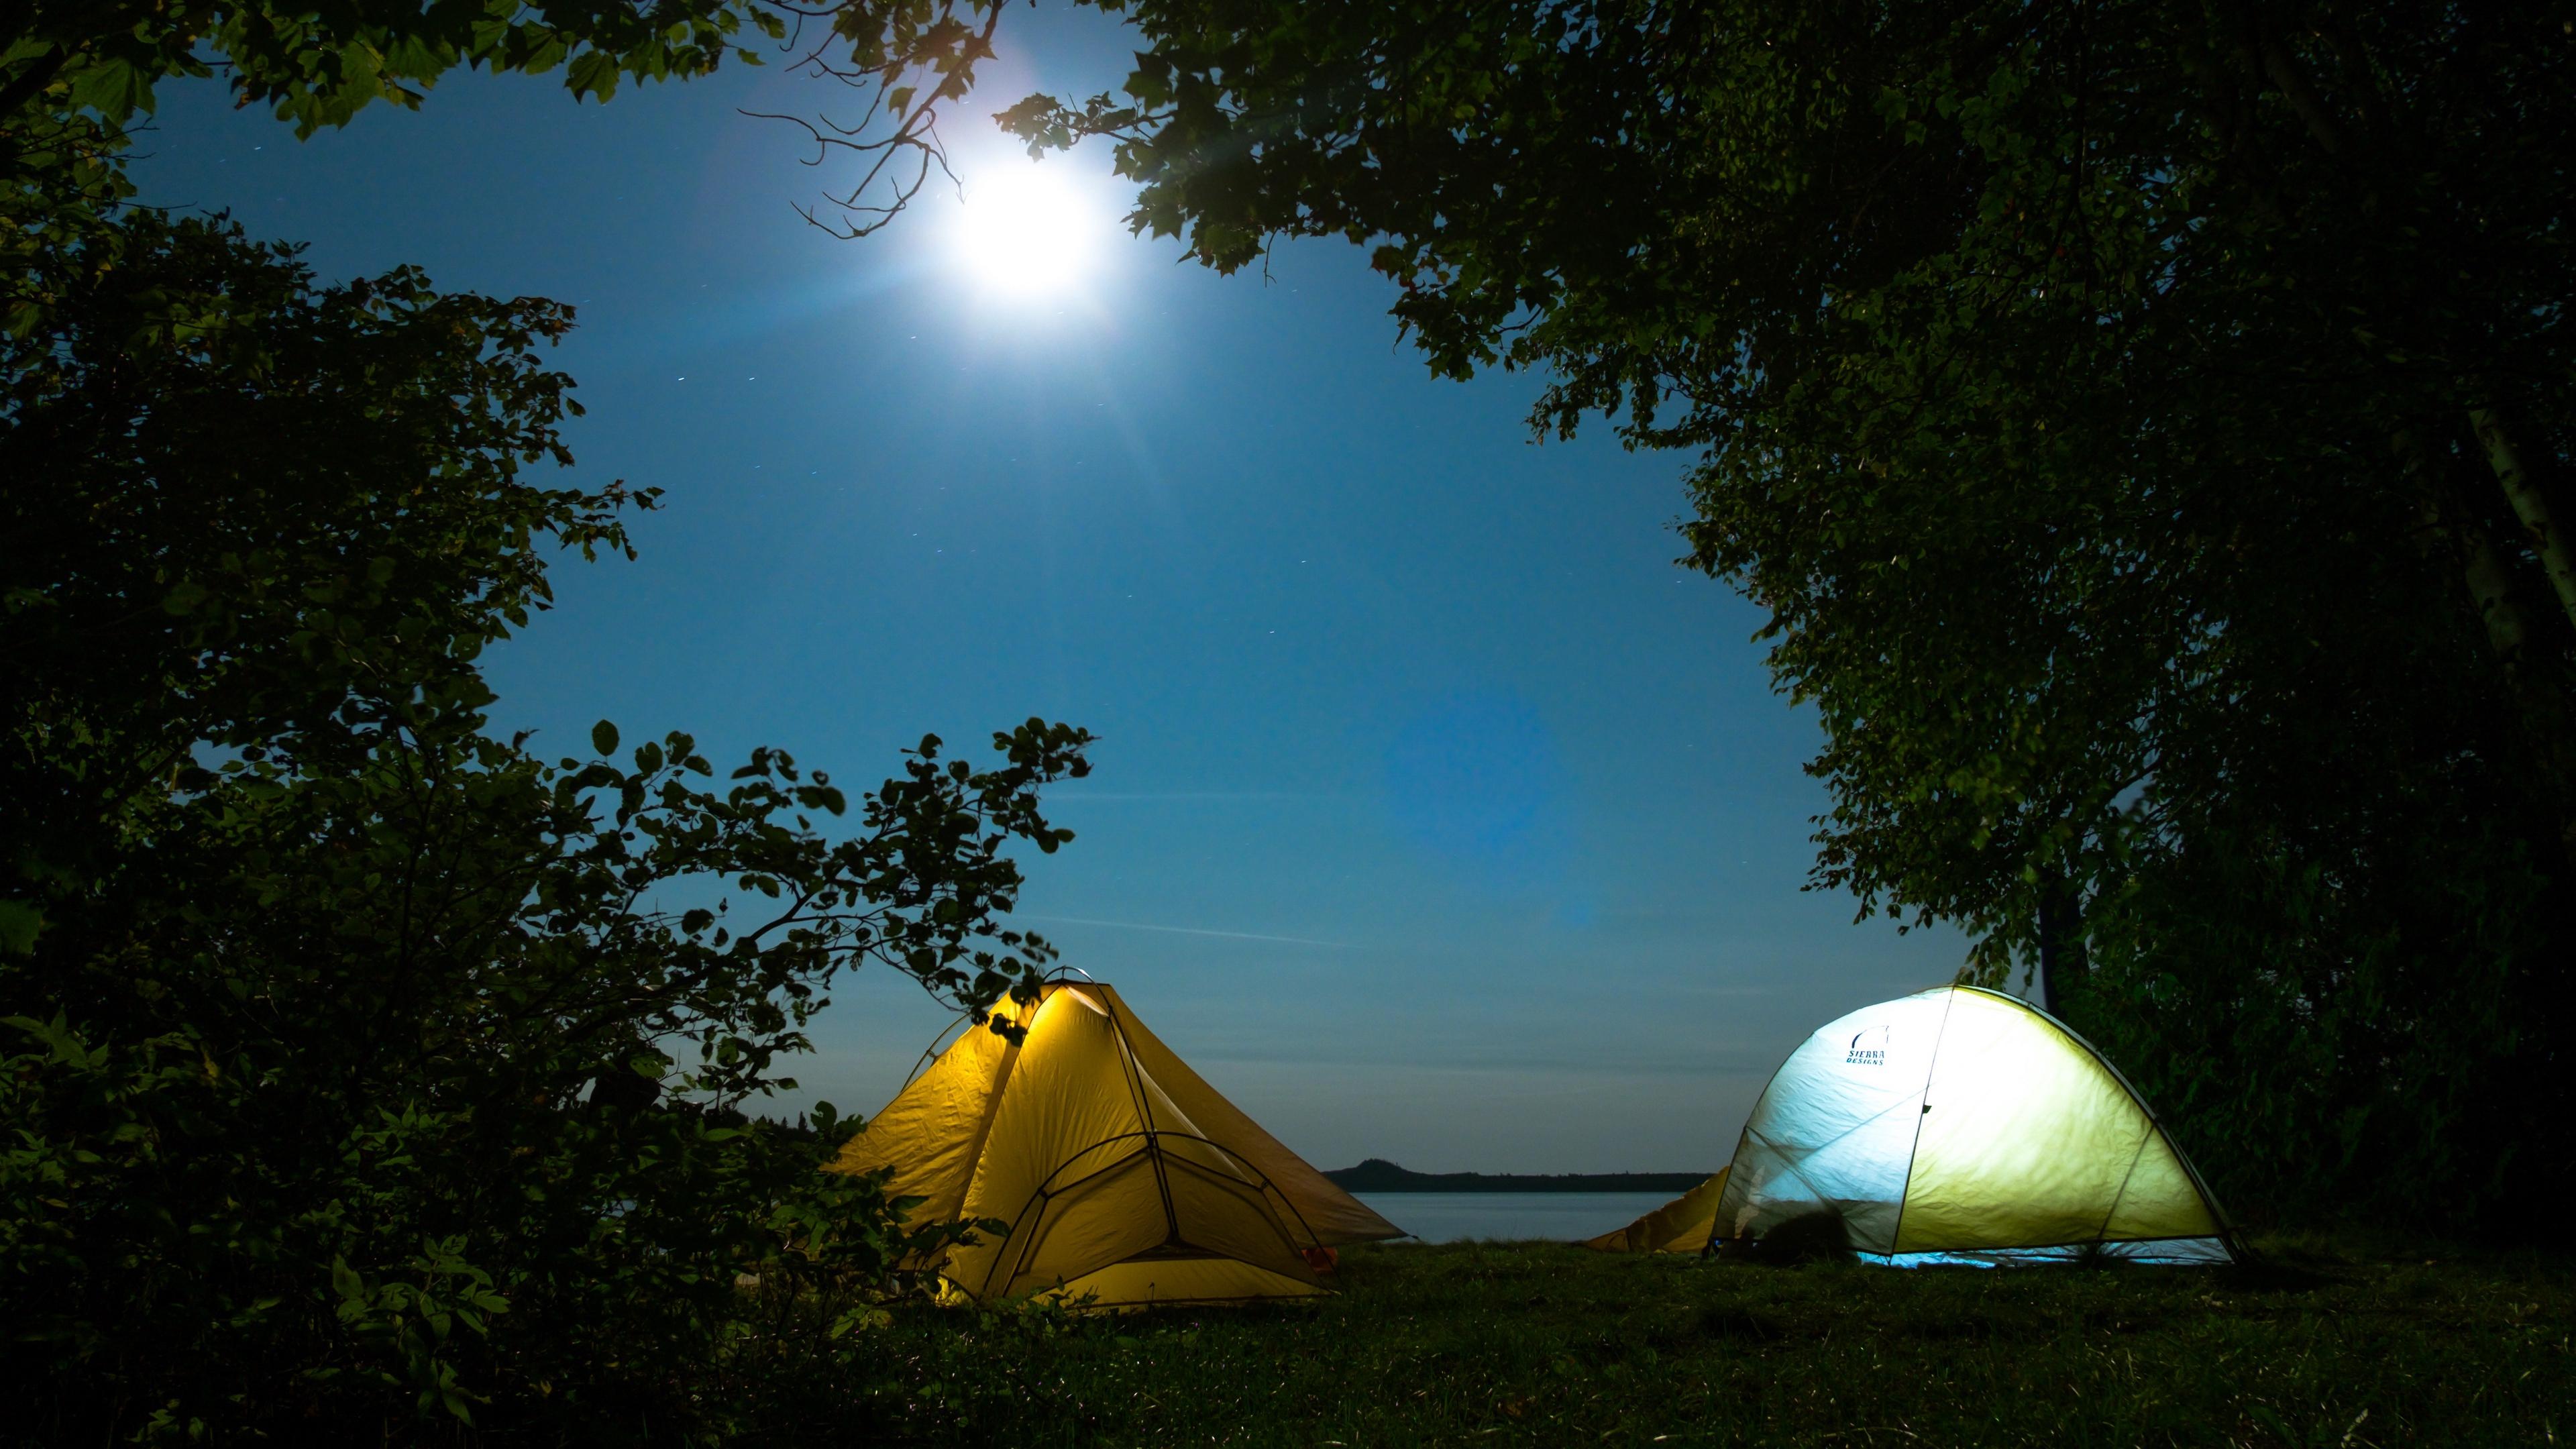 tents camping trees 4k 1541114033 - tents, camping, trees 4k - Trees, tents, Camping